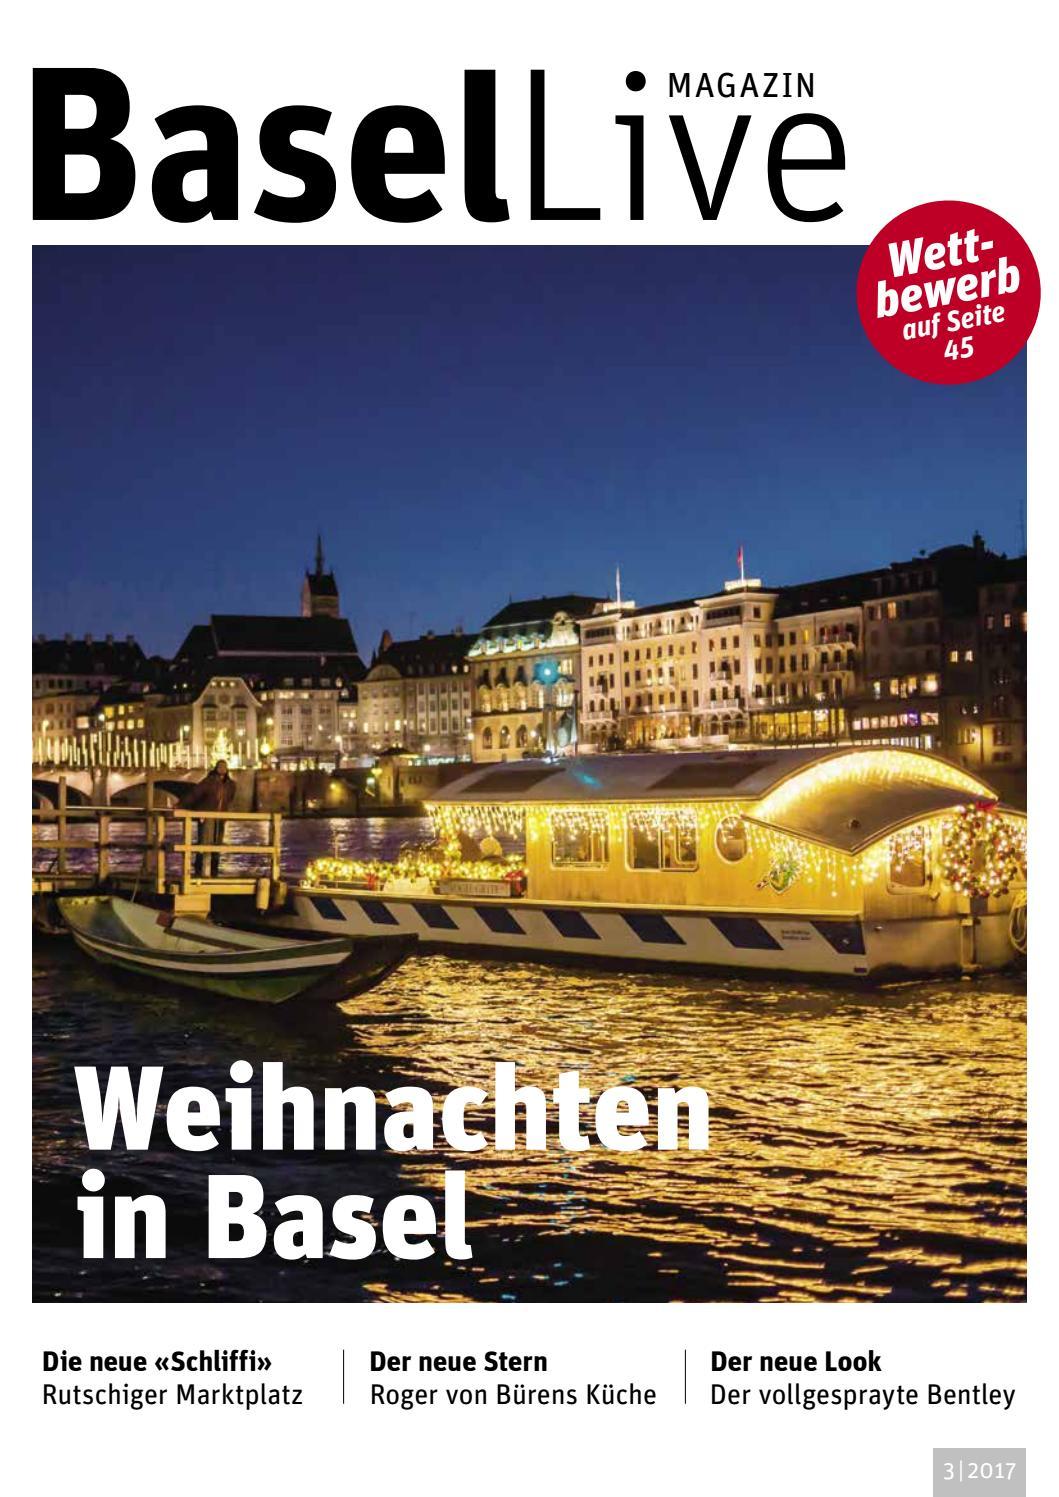 Suche nette Leute aus Region Basel (1/1) - SAPS Forum